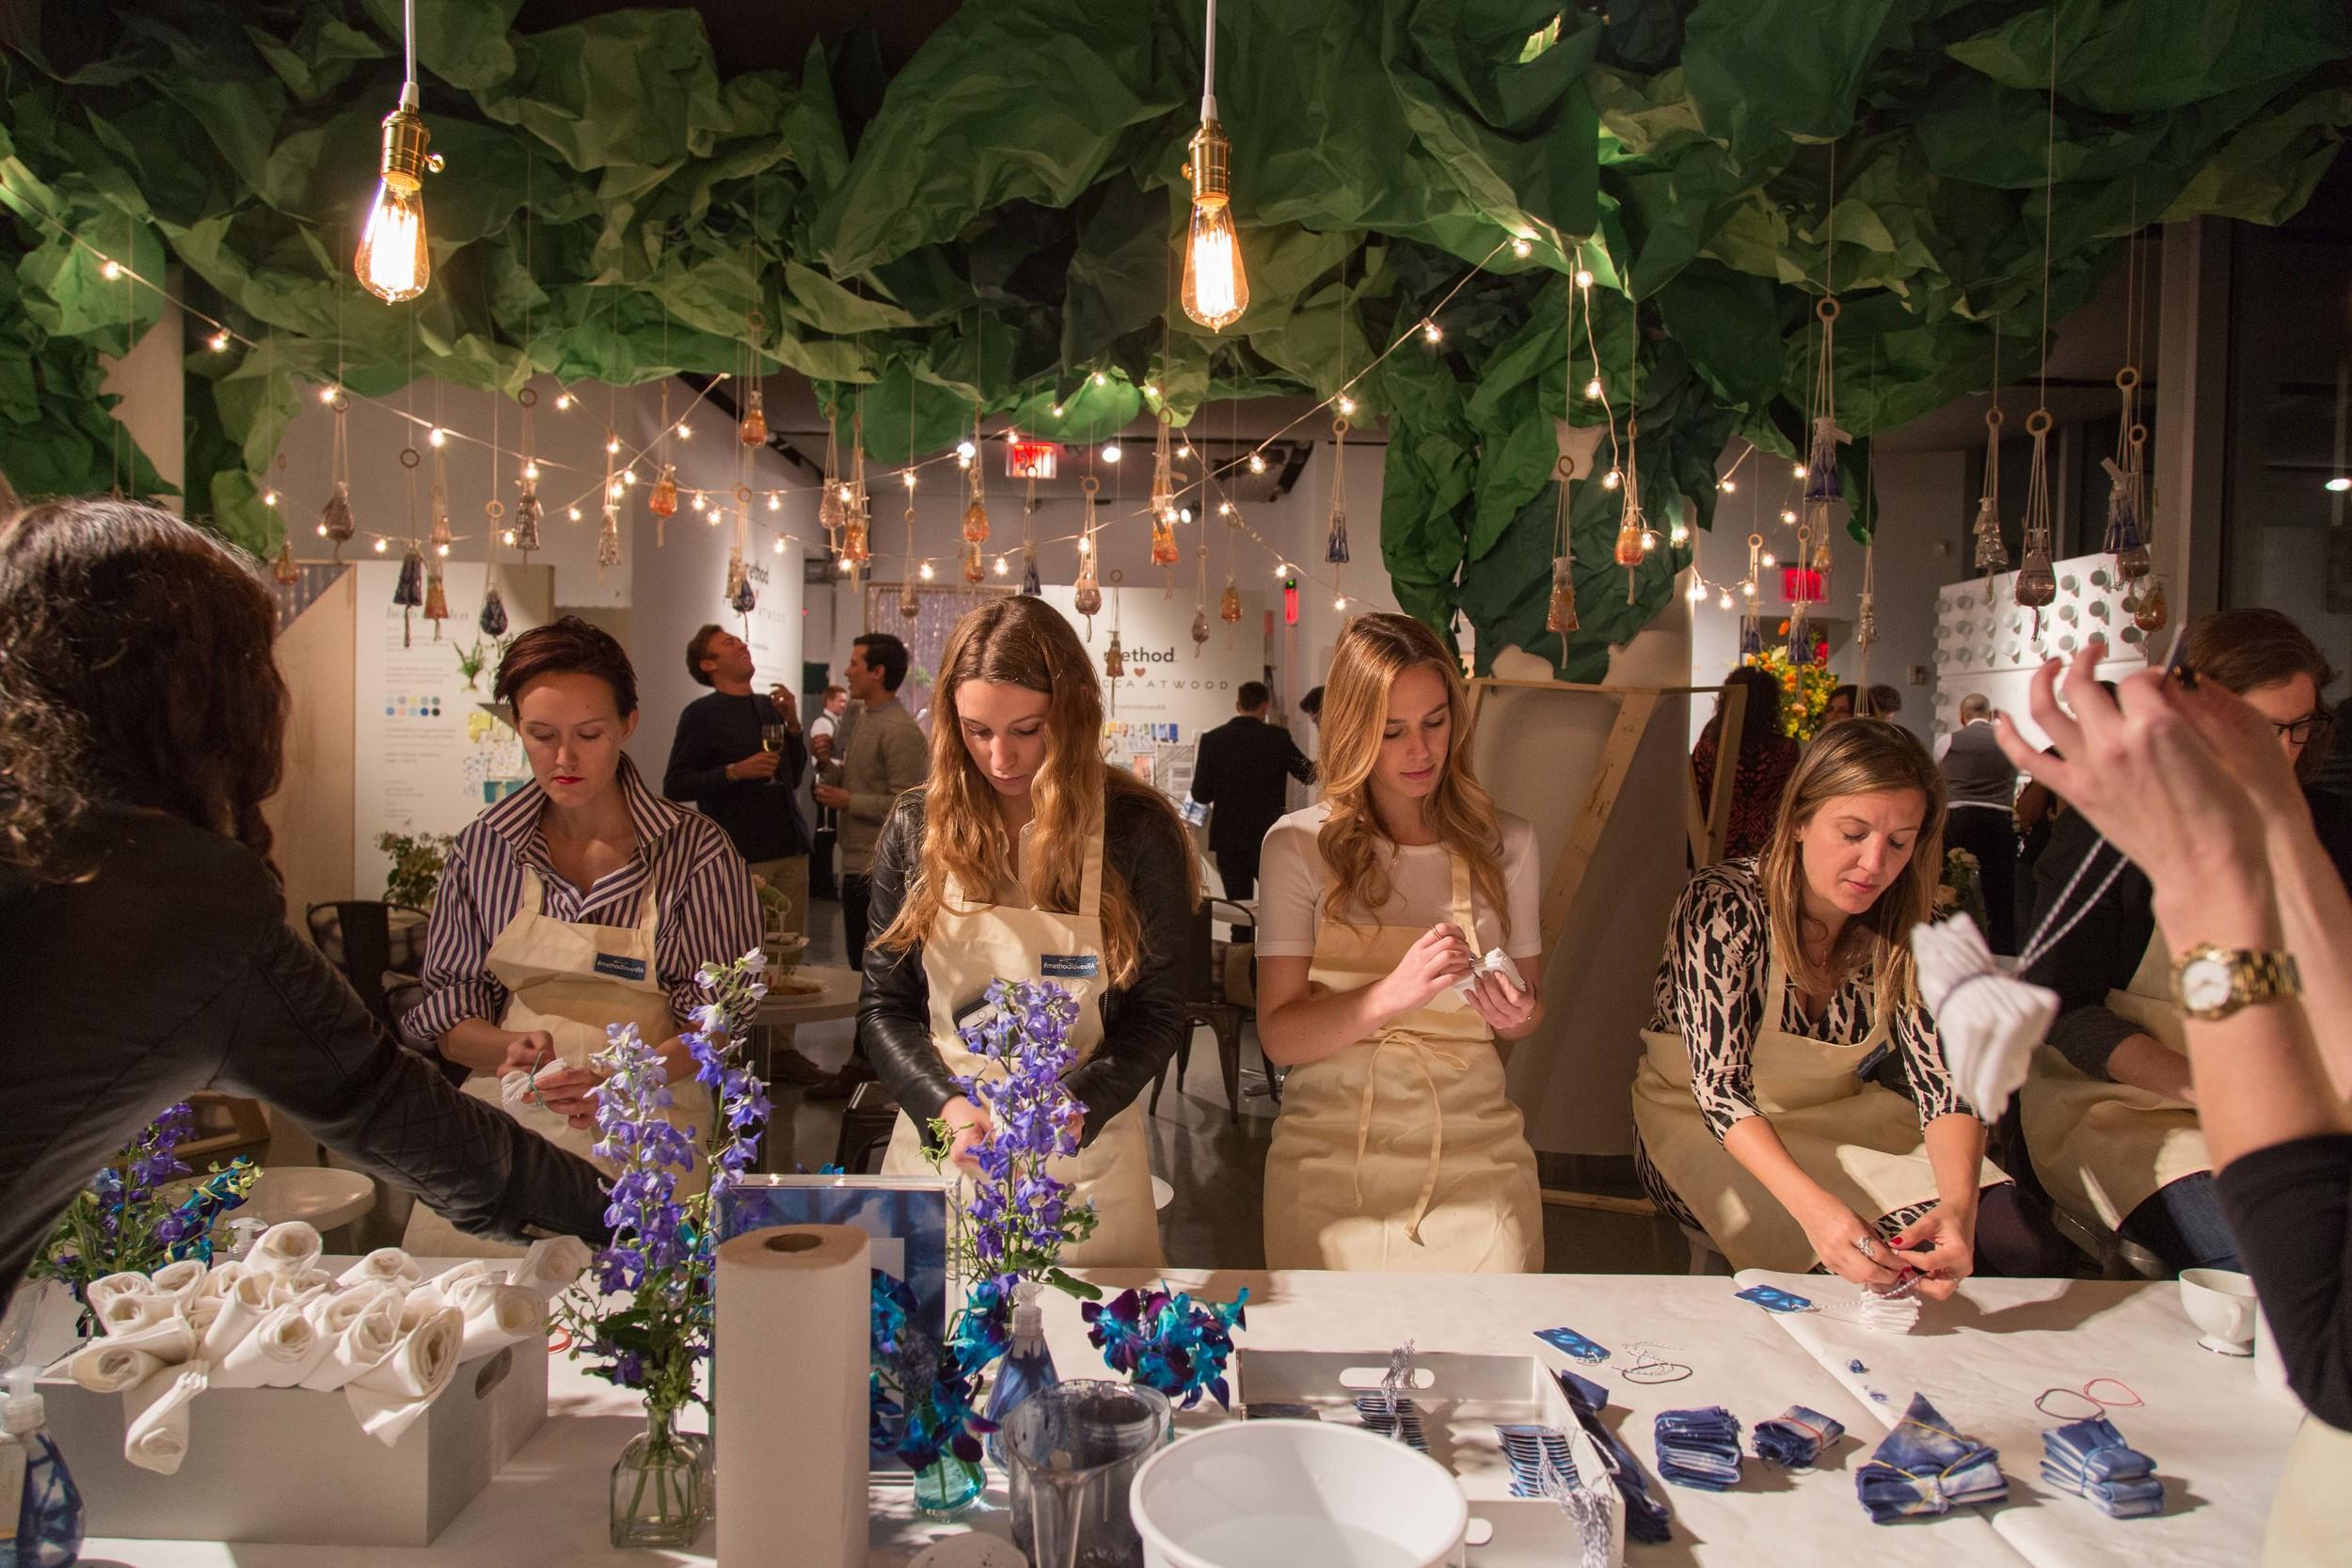 Shibori Dye Table at Method x Rebecca Atwood - New York Editor's Event